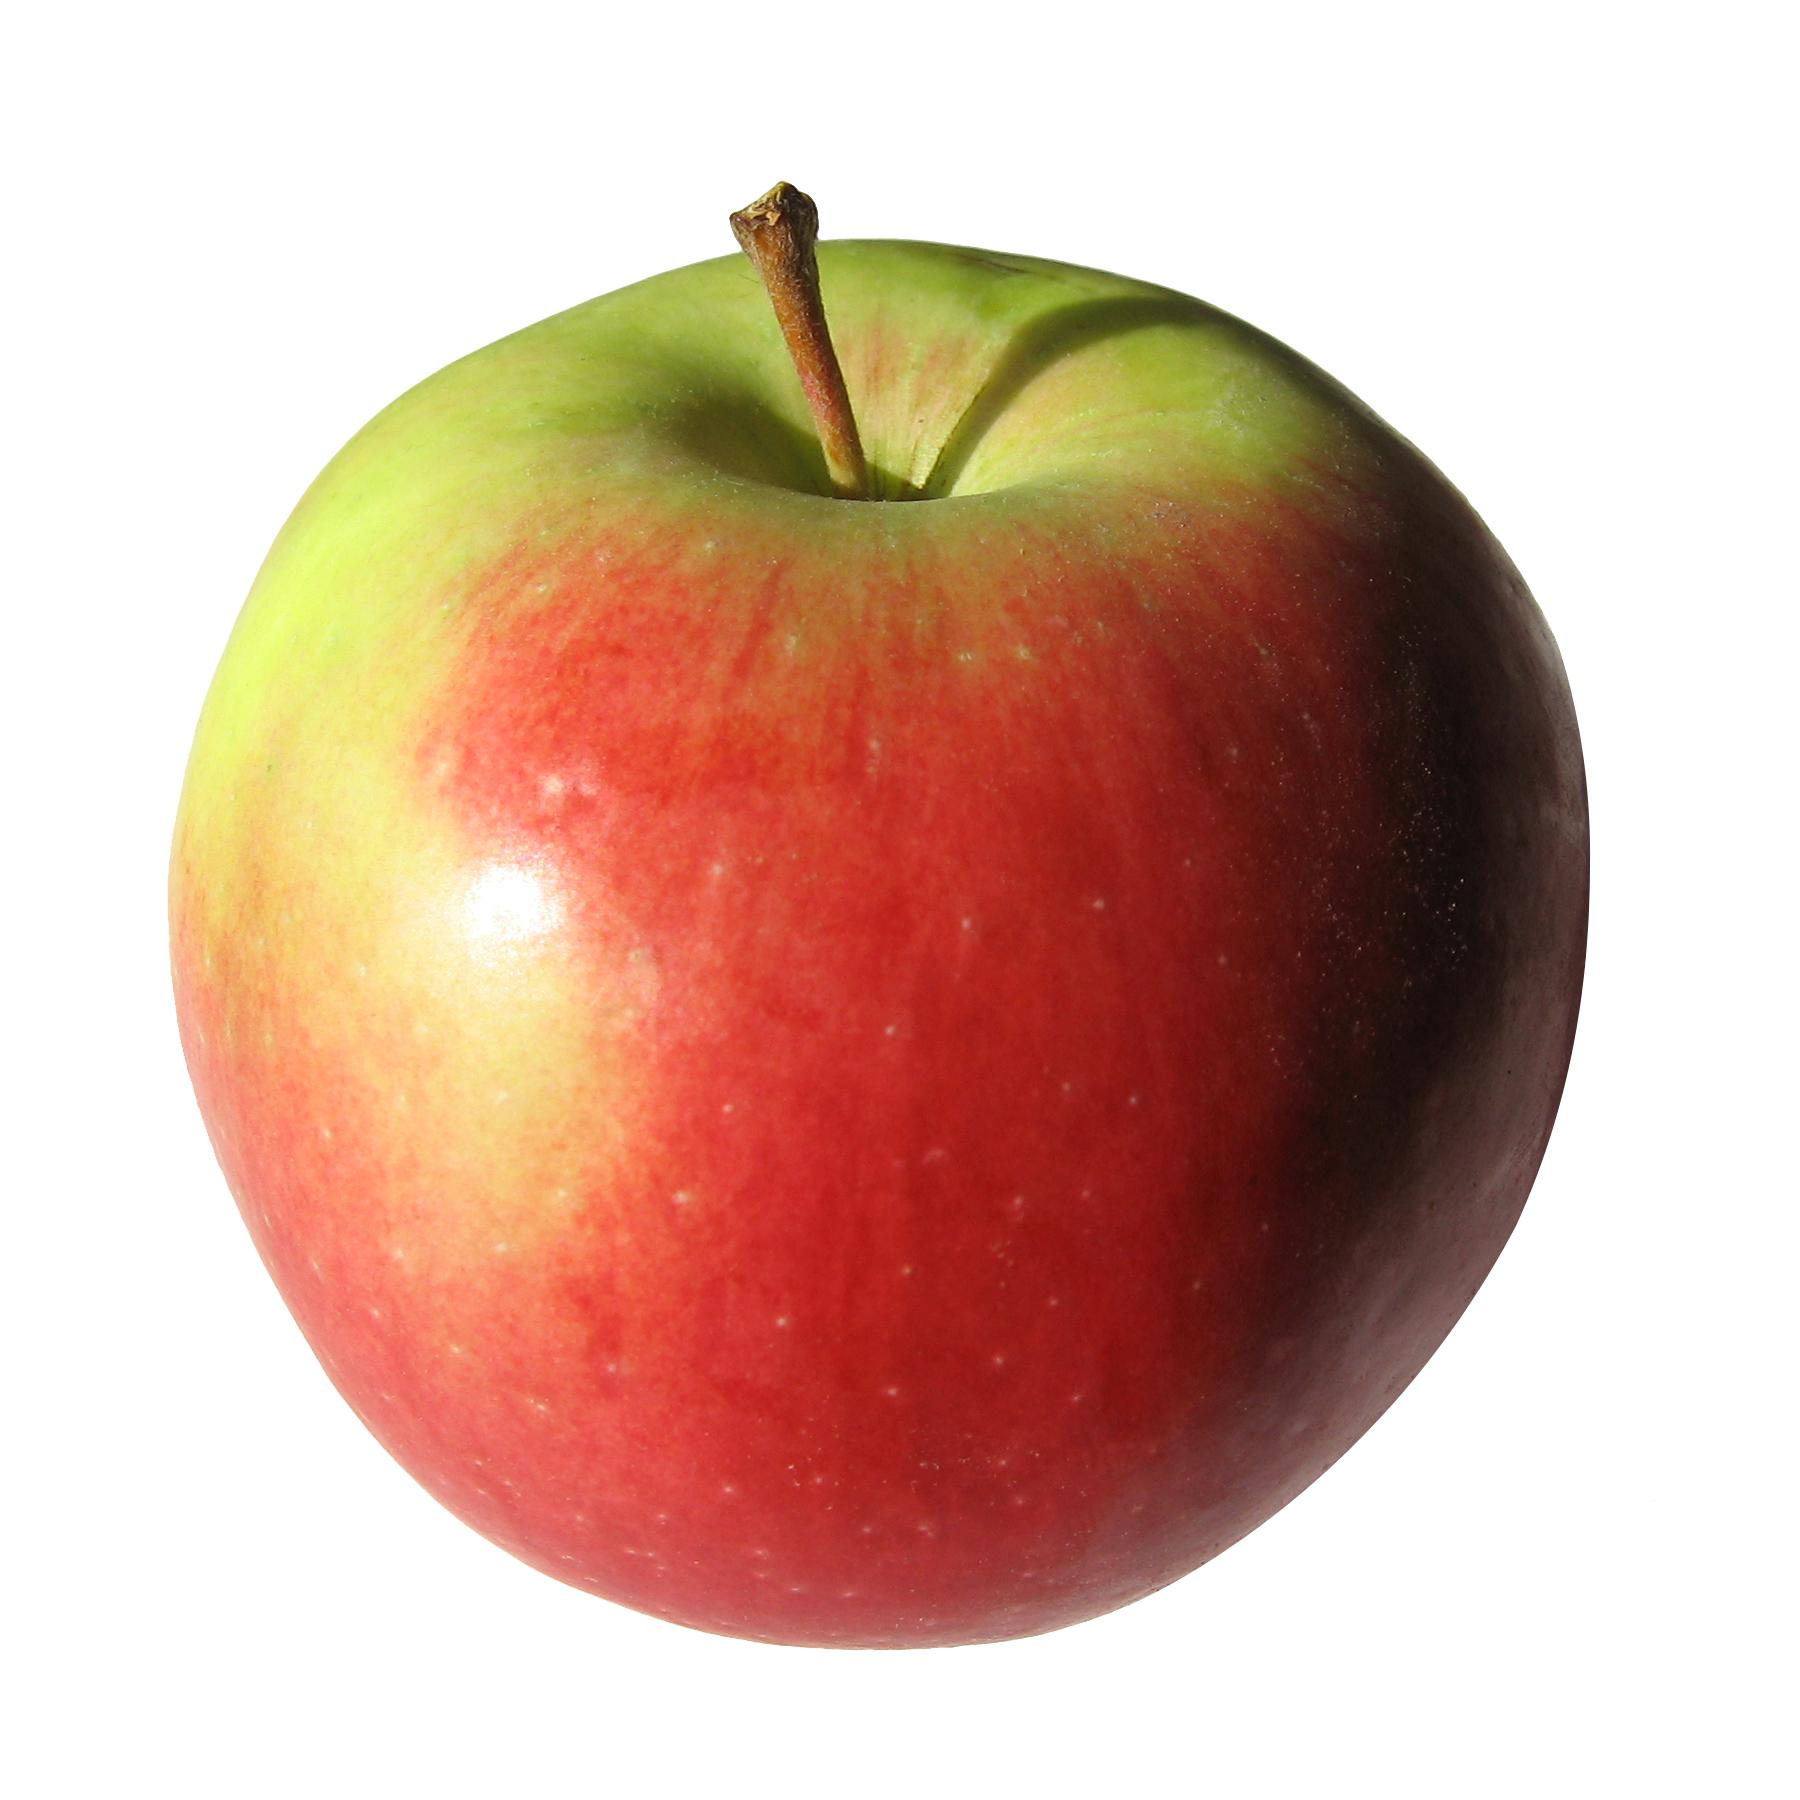 Спелое яблоко, фото, крупно